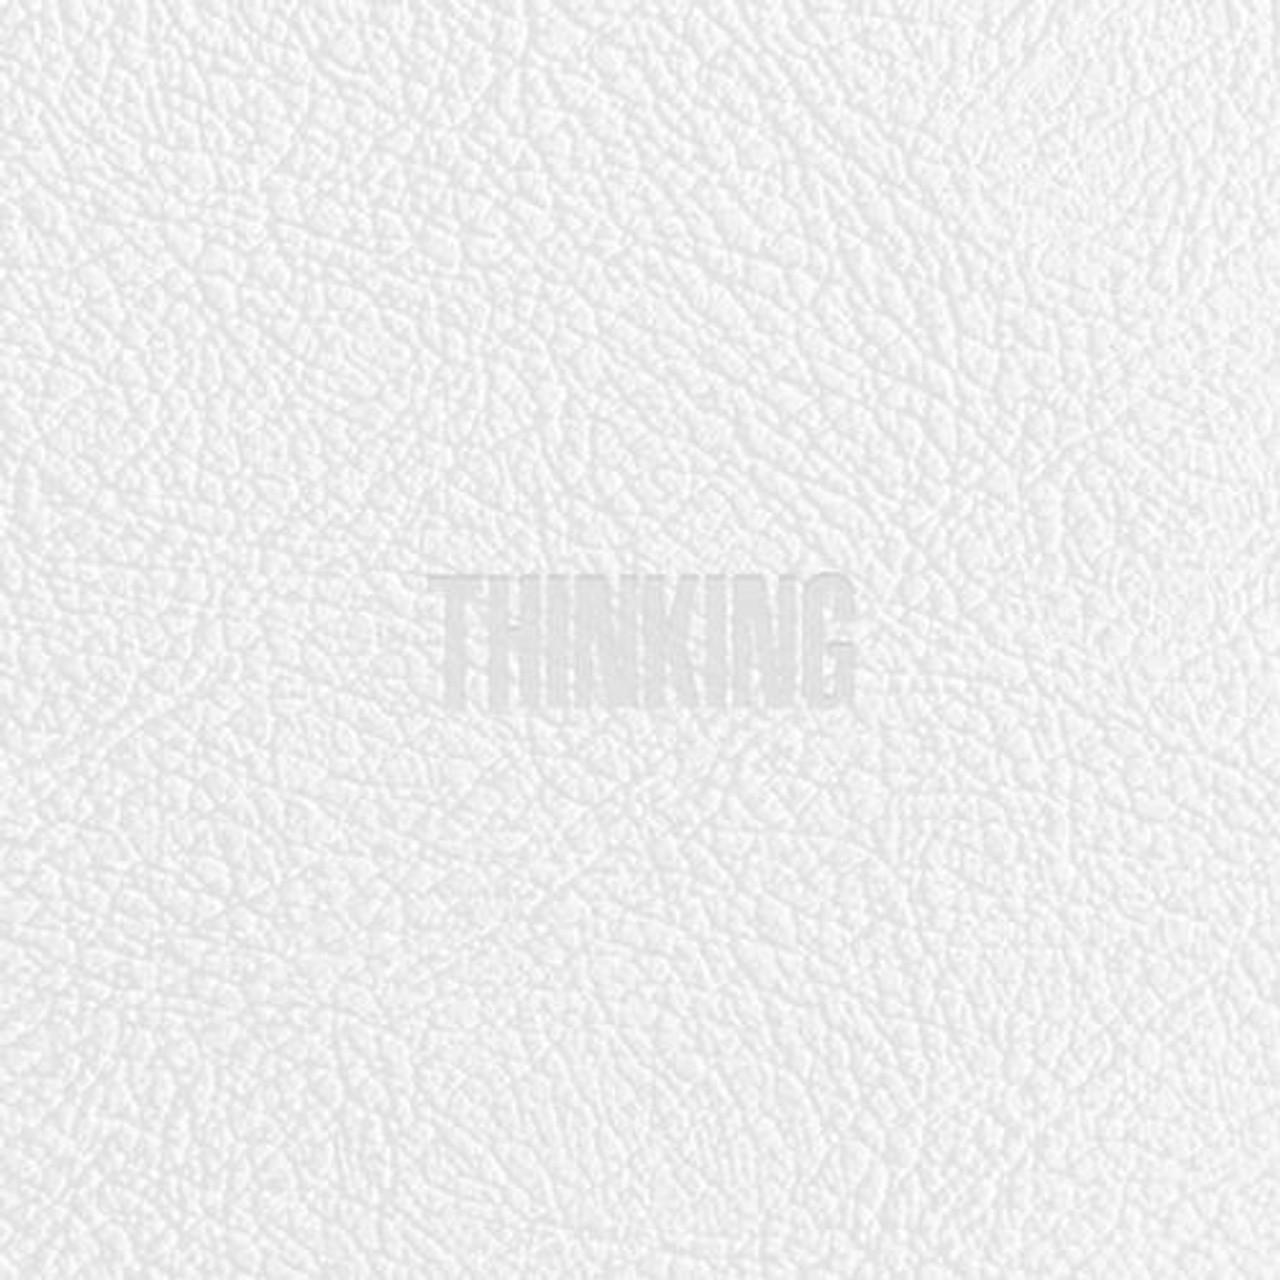 ZICO - Vol.1 [THINKING] + Poster